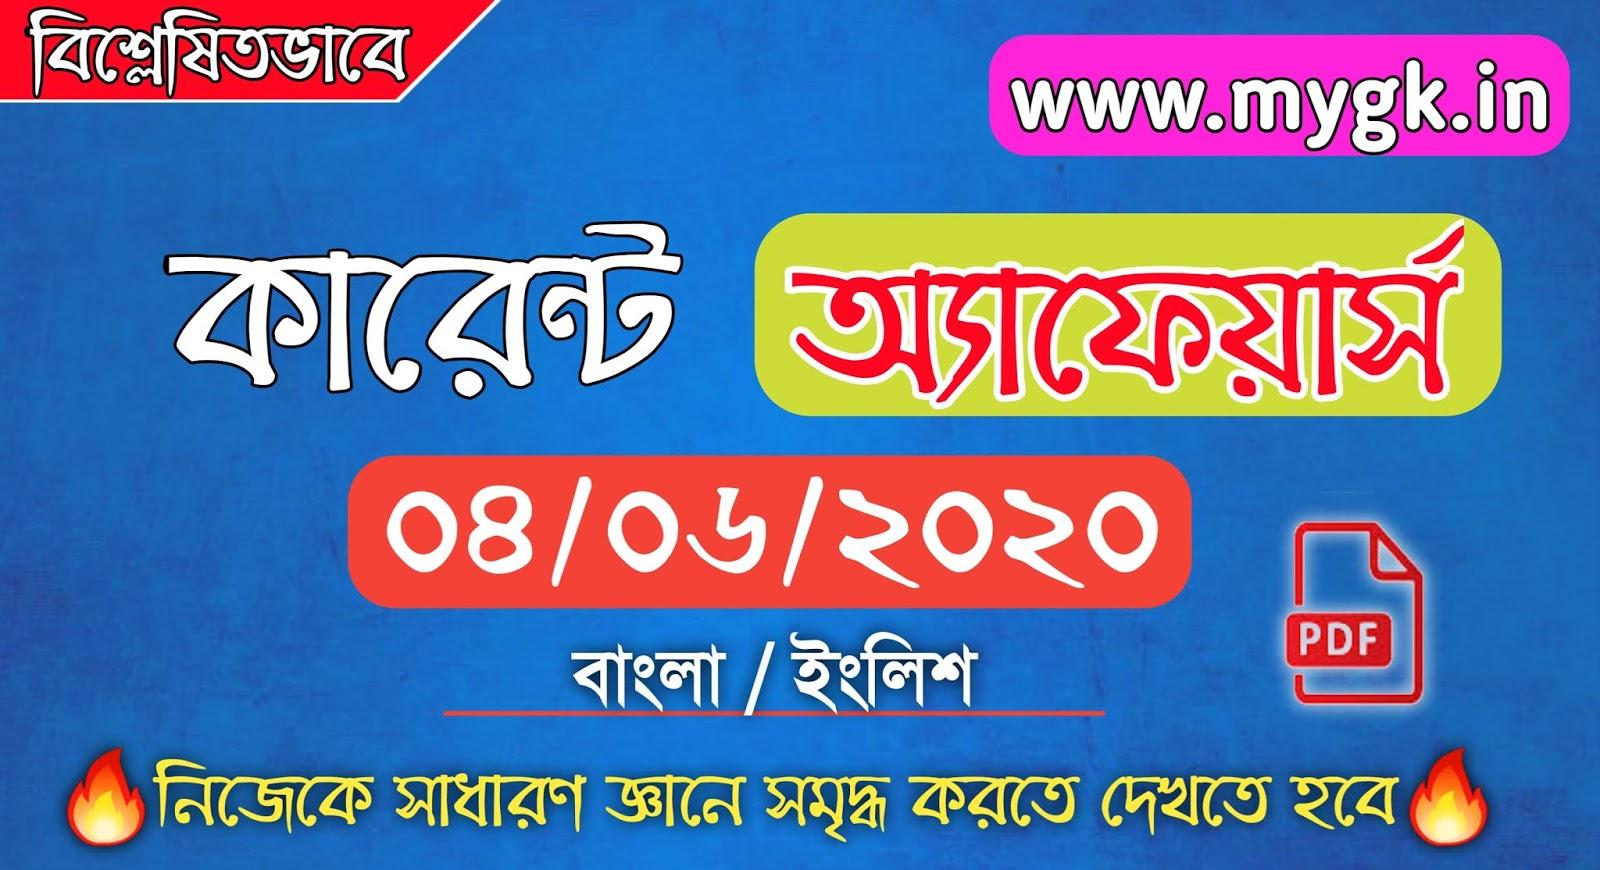 current affairs 2020 bangla, bangla current affairs, current affairs in bengali, karent afairs, karent afers